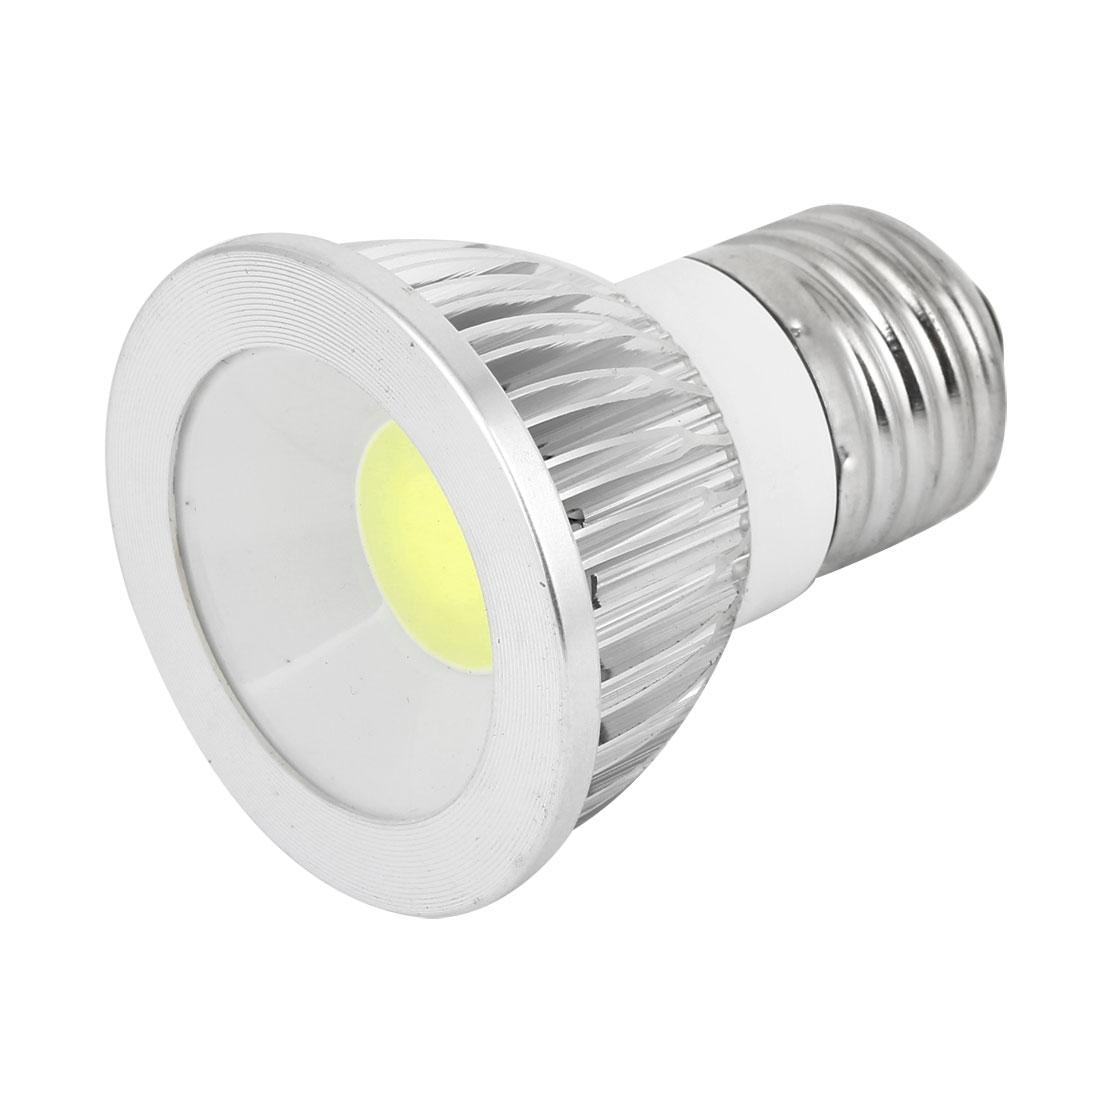 AC 85-265V 6W E27 Non-dimmable Cool White Light COB LED Downlight Spotlight